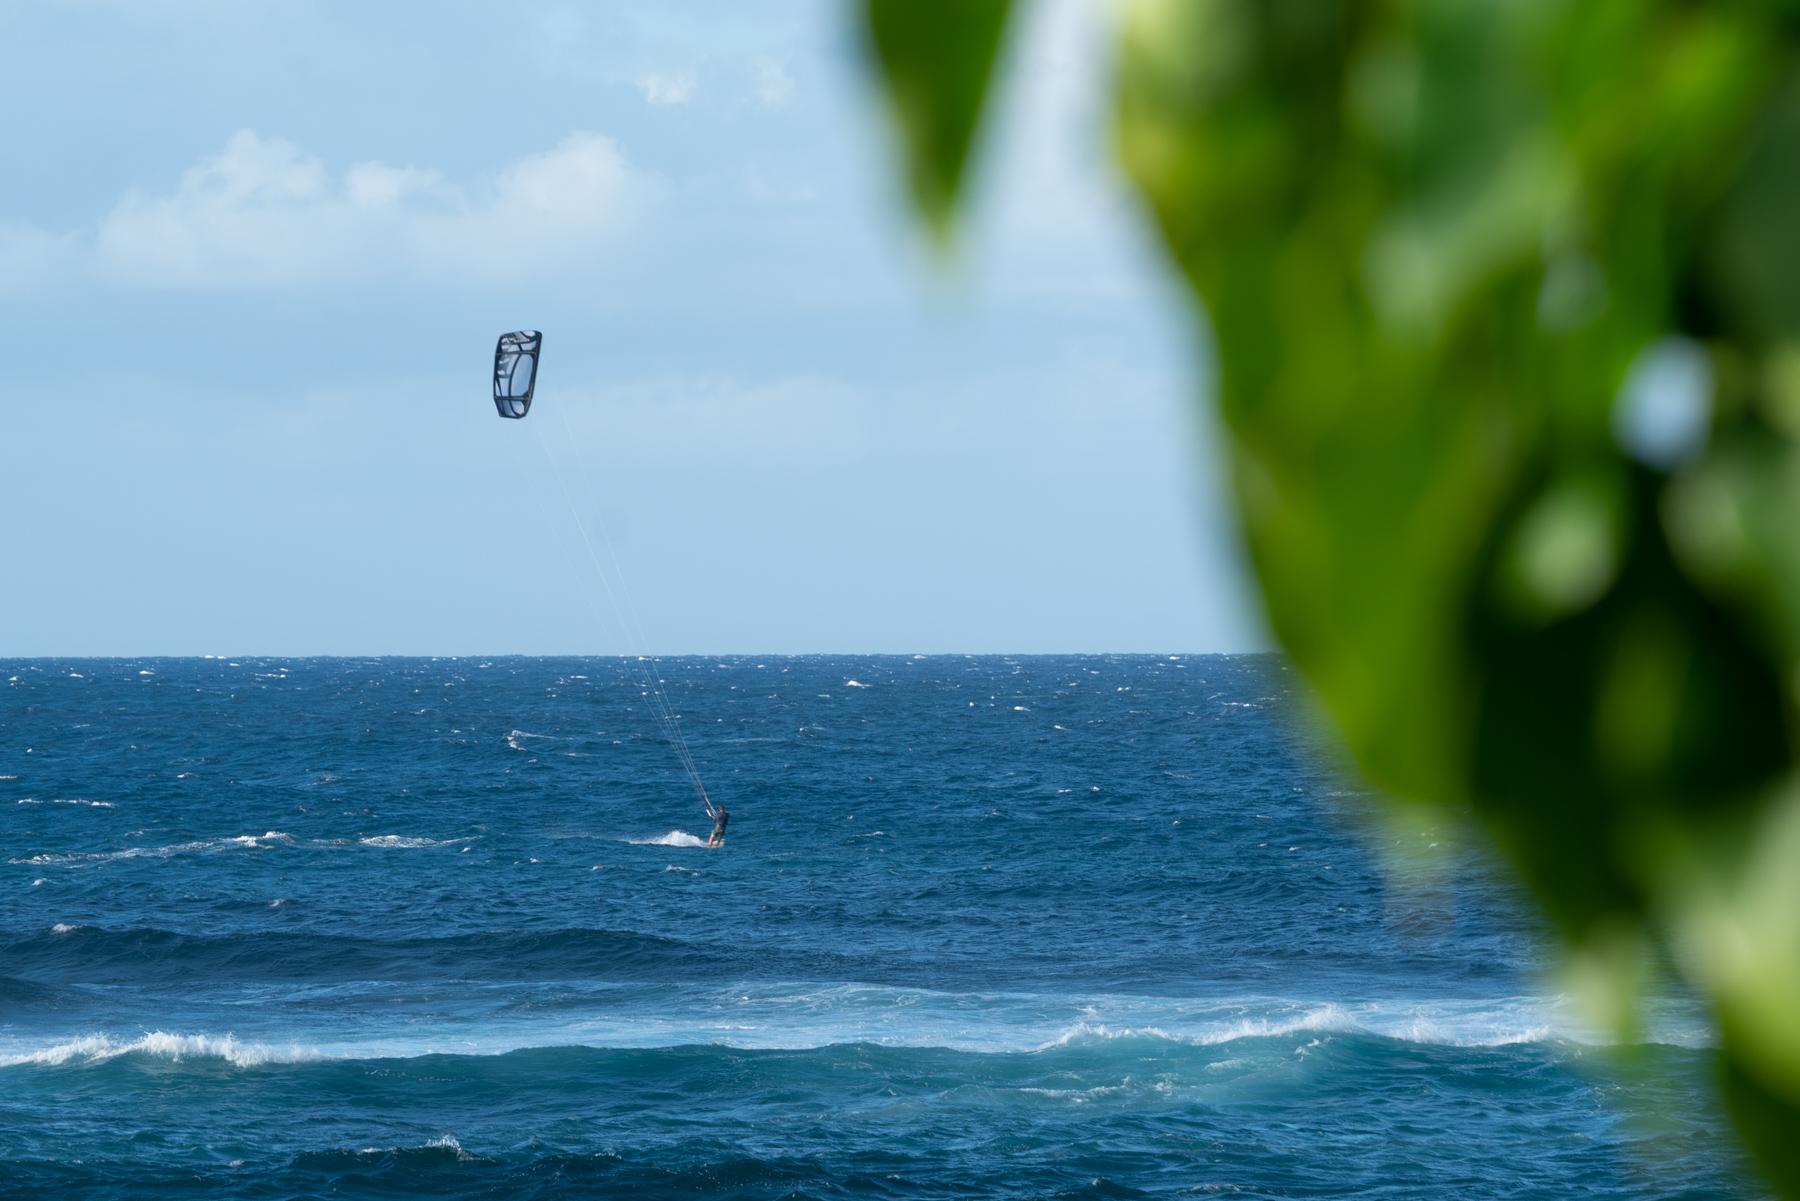 Maui-Trip-Kite-18.jpg